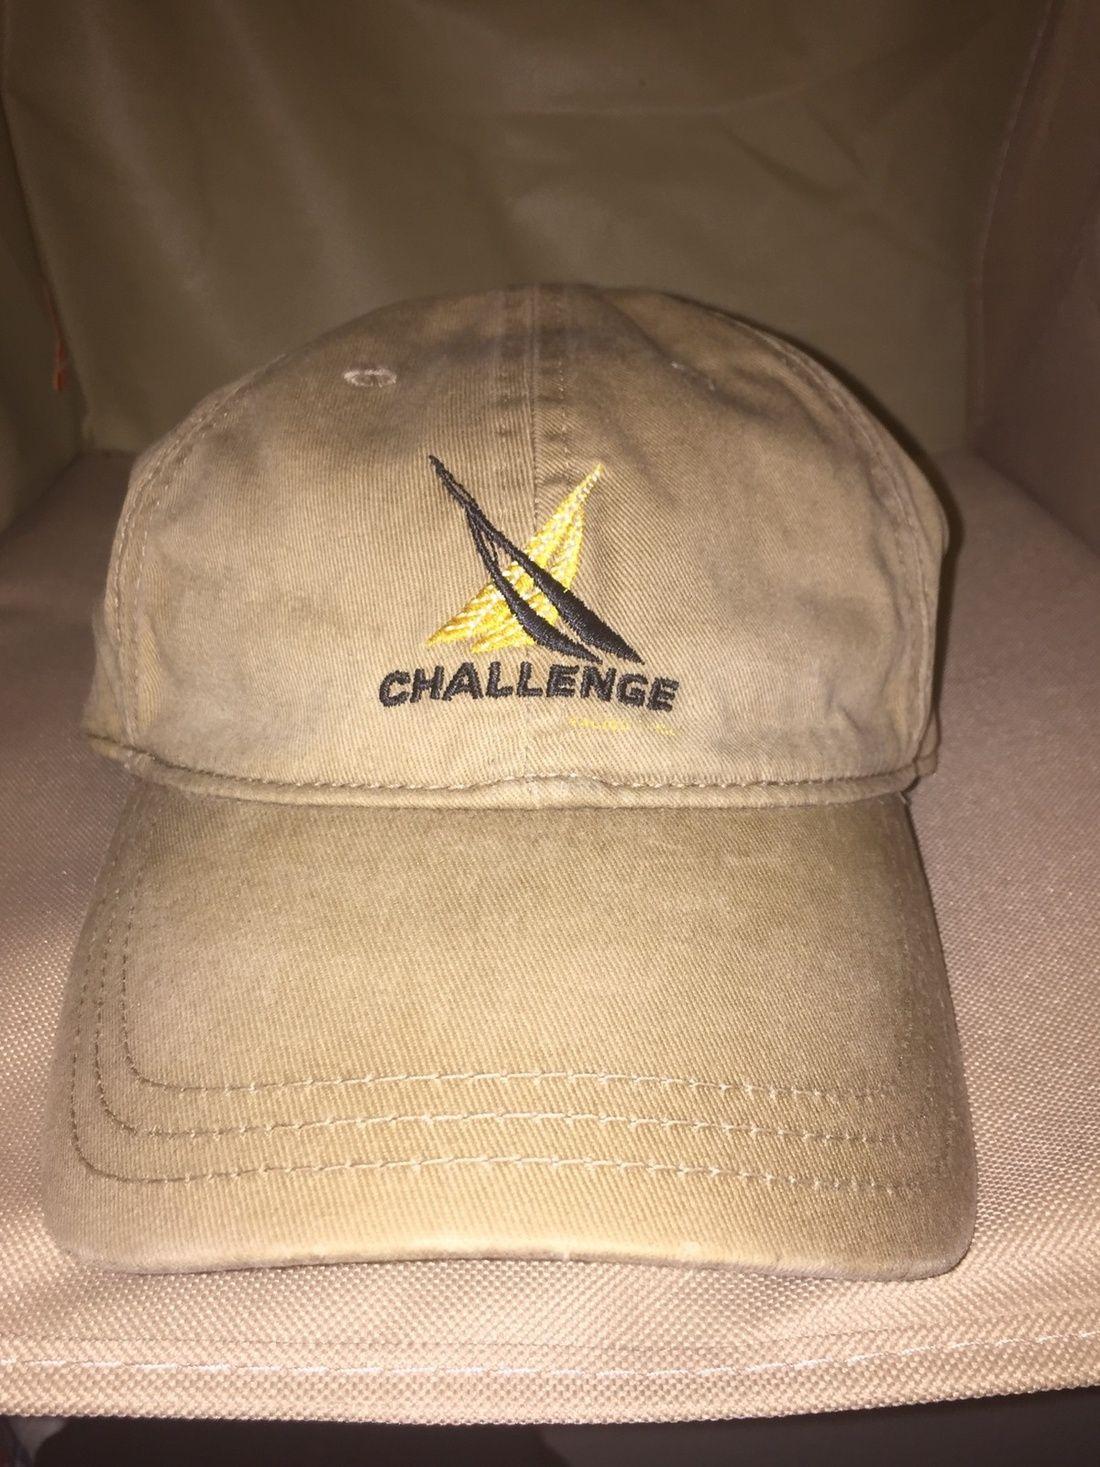 6657c4e8 Nautica Vintage Nautica Challenge Dad Cap Size One Size $14 - Grailed